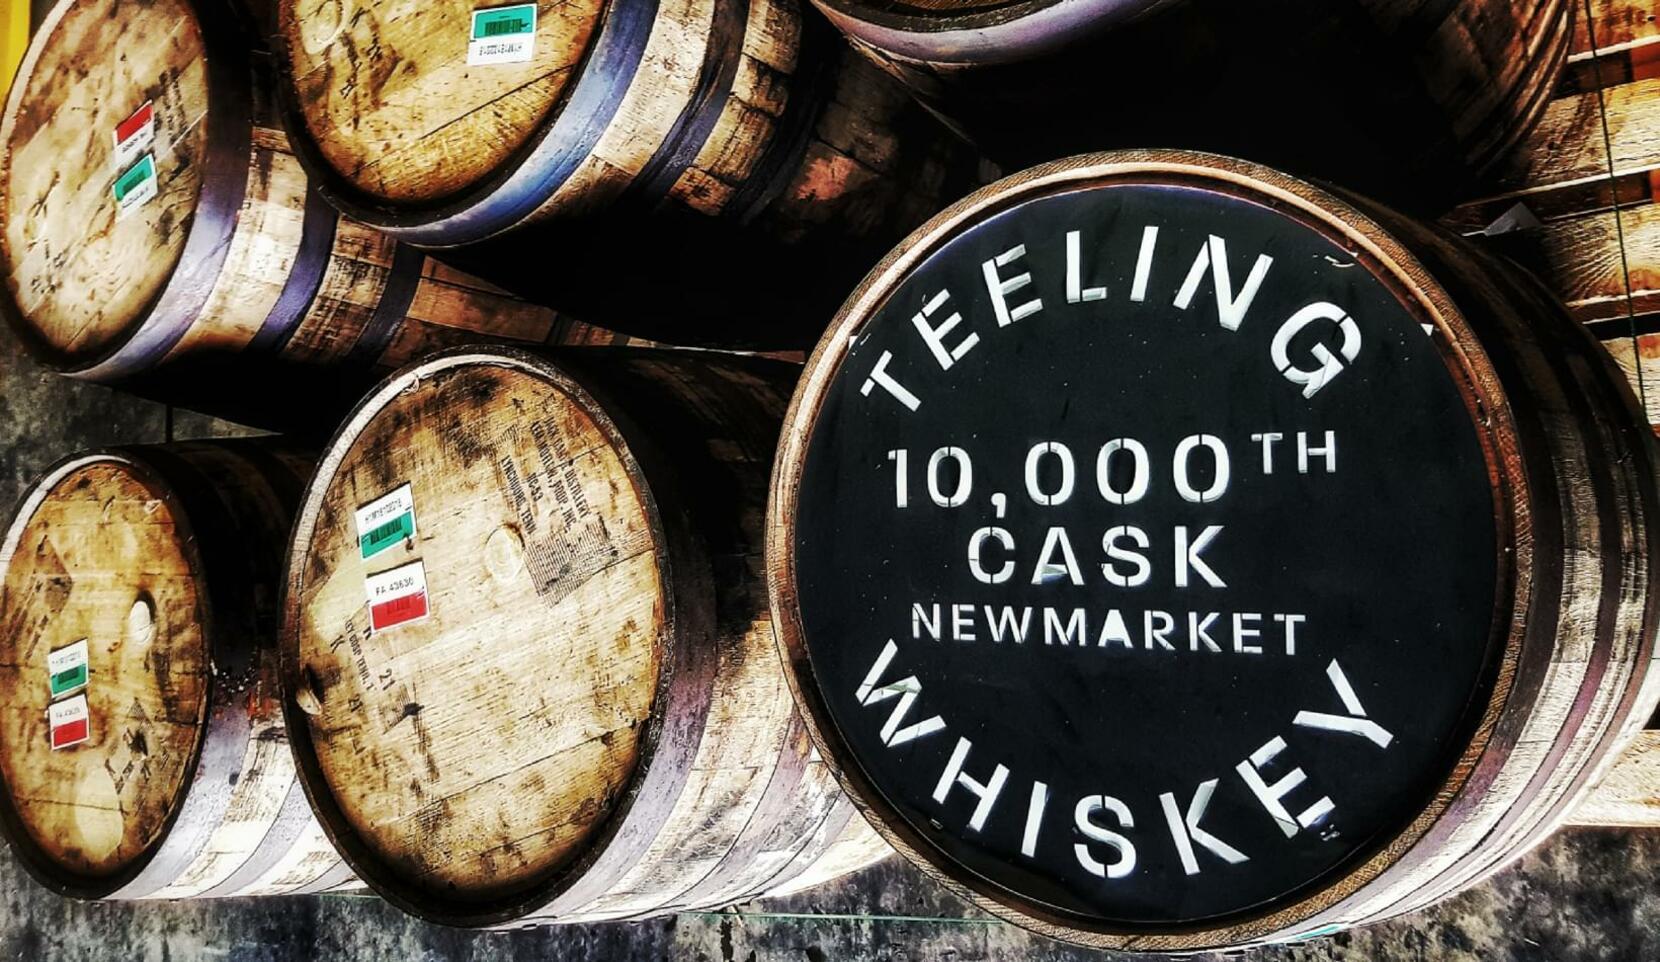 Award Winning Teeling Whiskey Fills 10,000th Cask of Dublin Distilled Whiskey